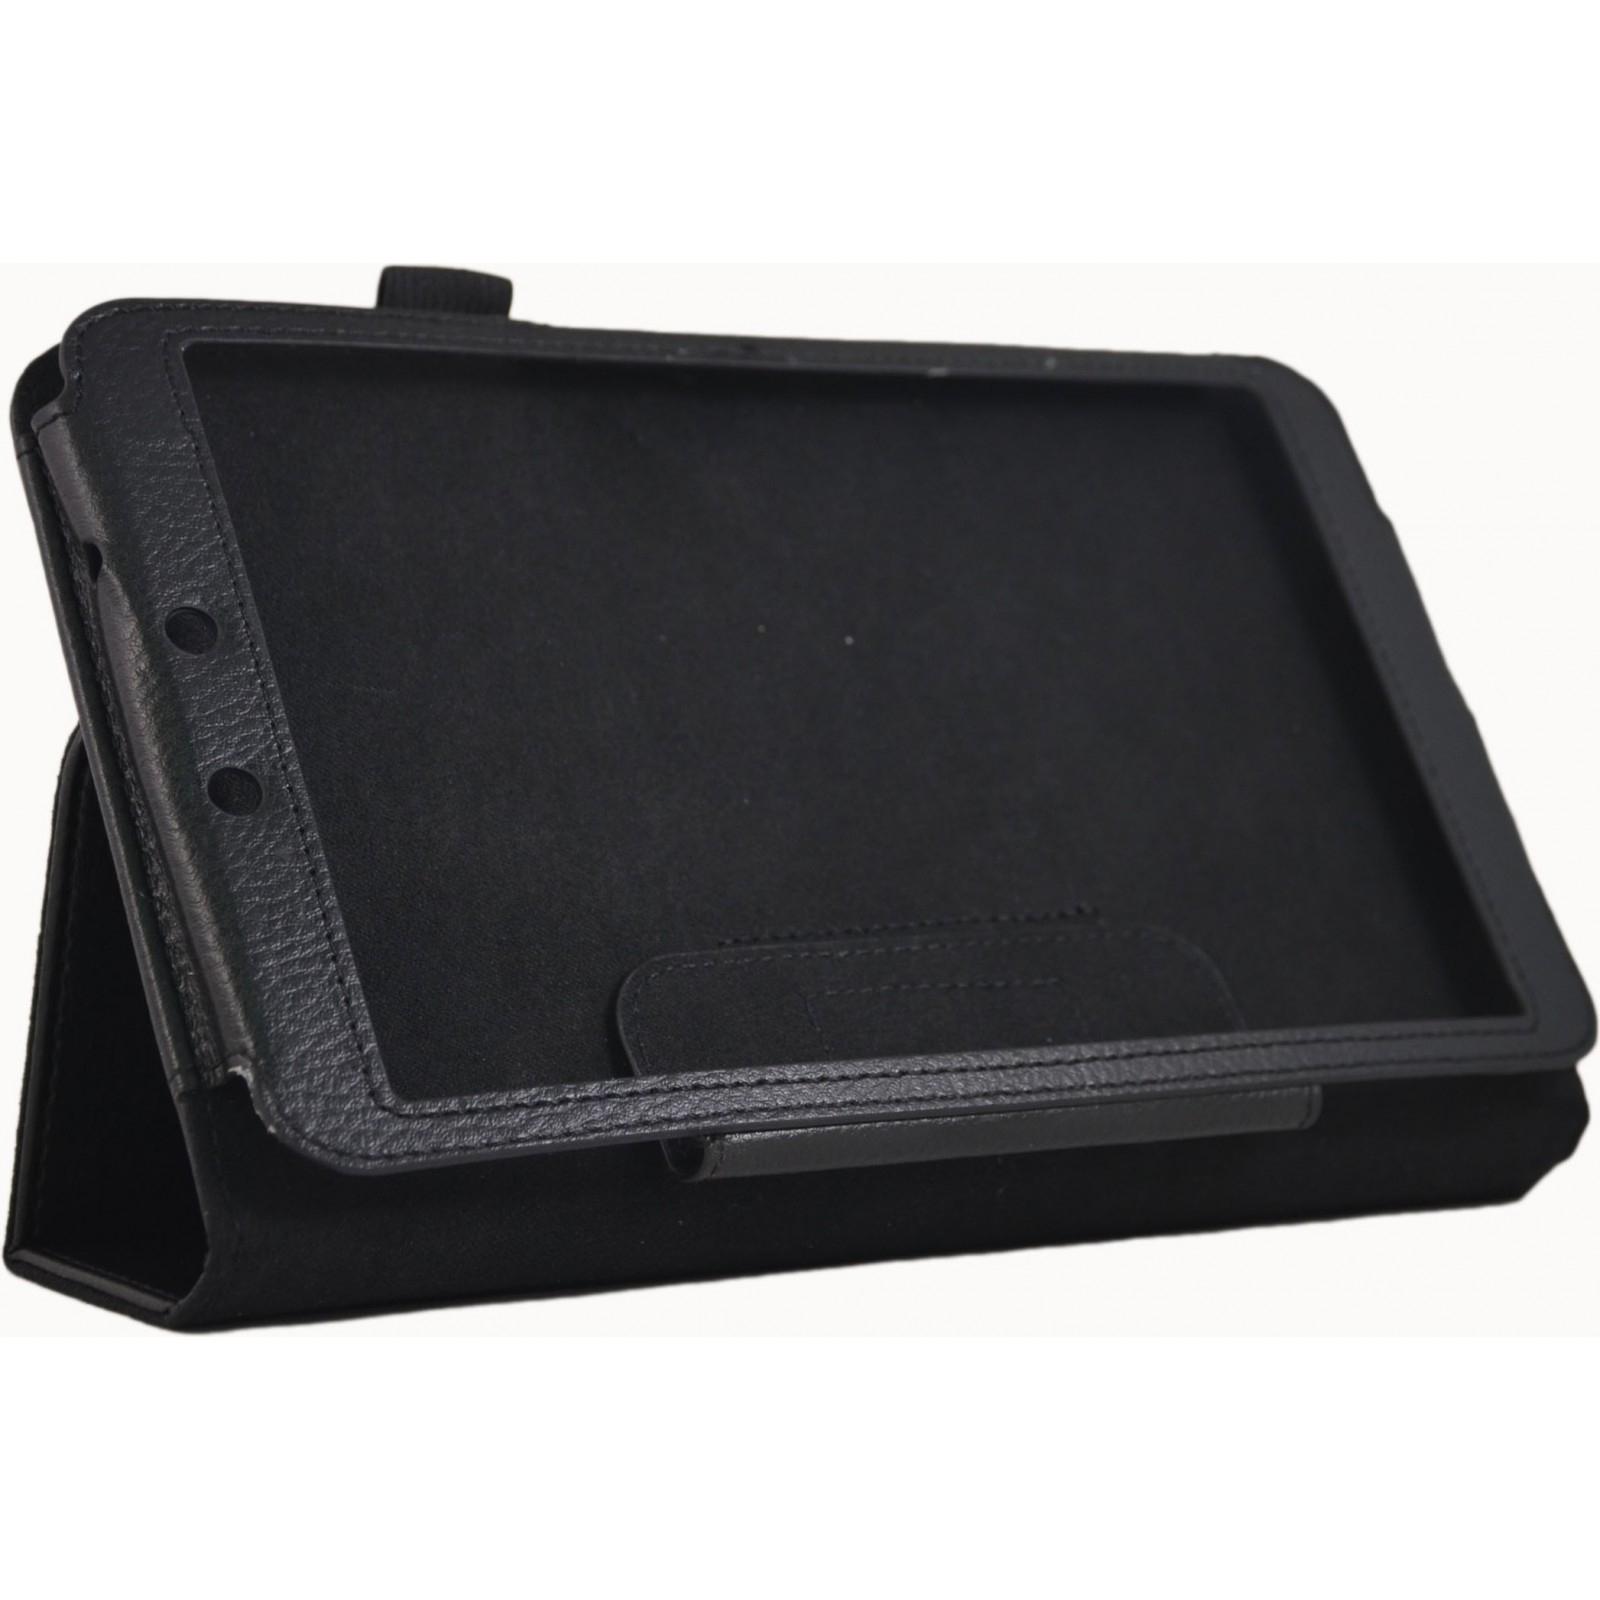 "Чехол для планшета Pro-case 8"" Pro-case Galaxy Tab 3 T3100 8"" (Tab 3 T3100) изображение 4"